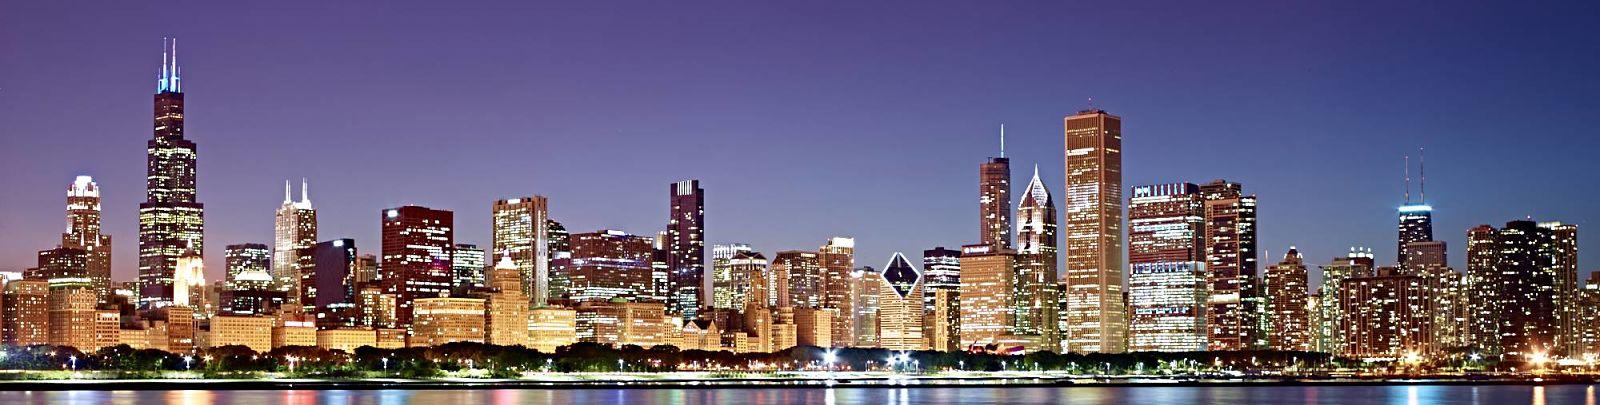 chicago skyline sunset night